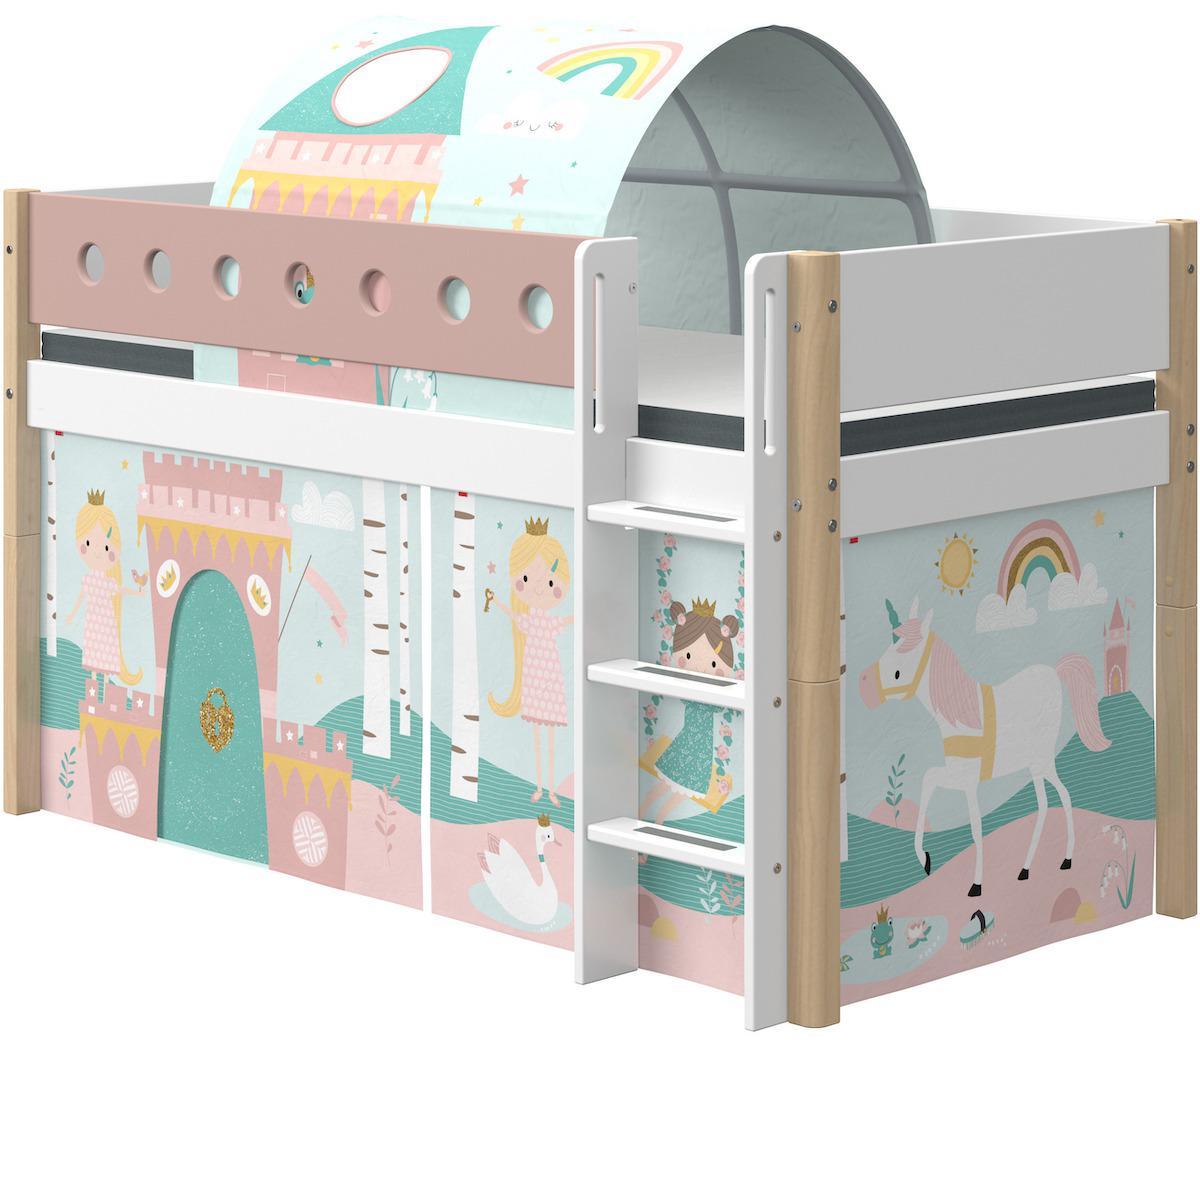 Cama media alta 90x190cm escalera recta WHITE Flexa natural-rosa claro